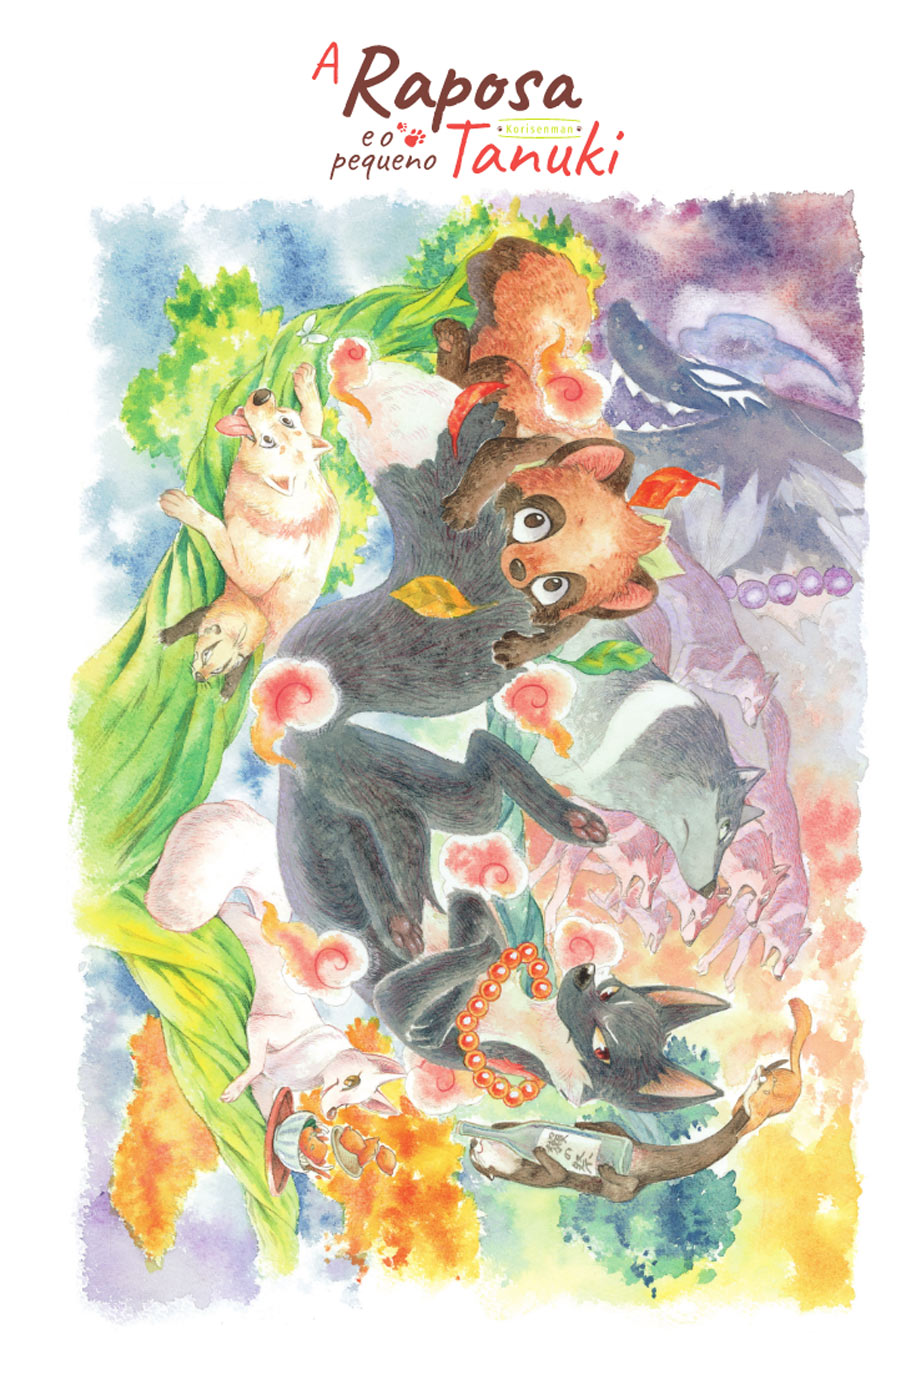 A Raposa e o Pequeno Tanuki